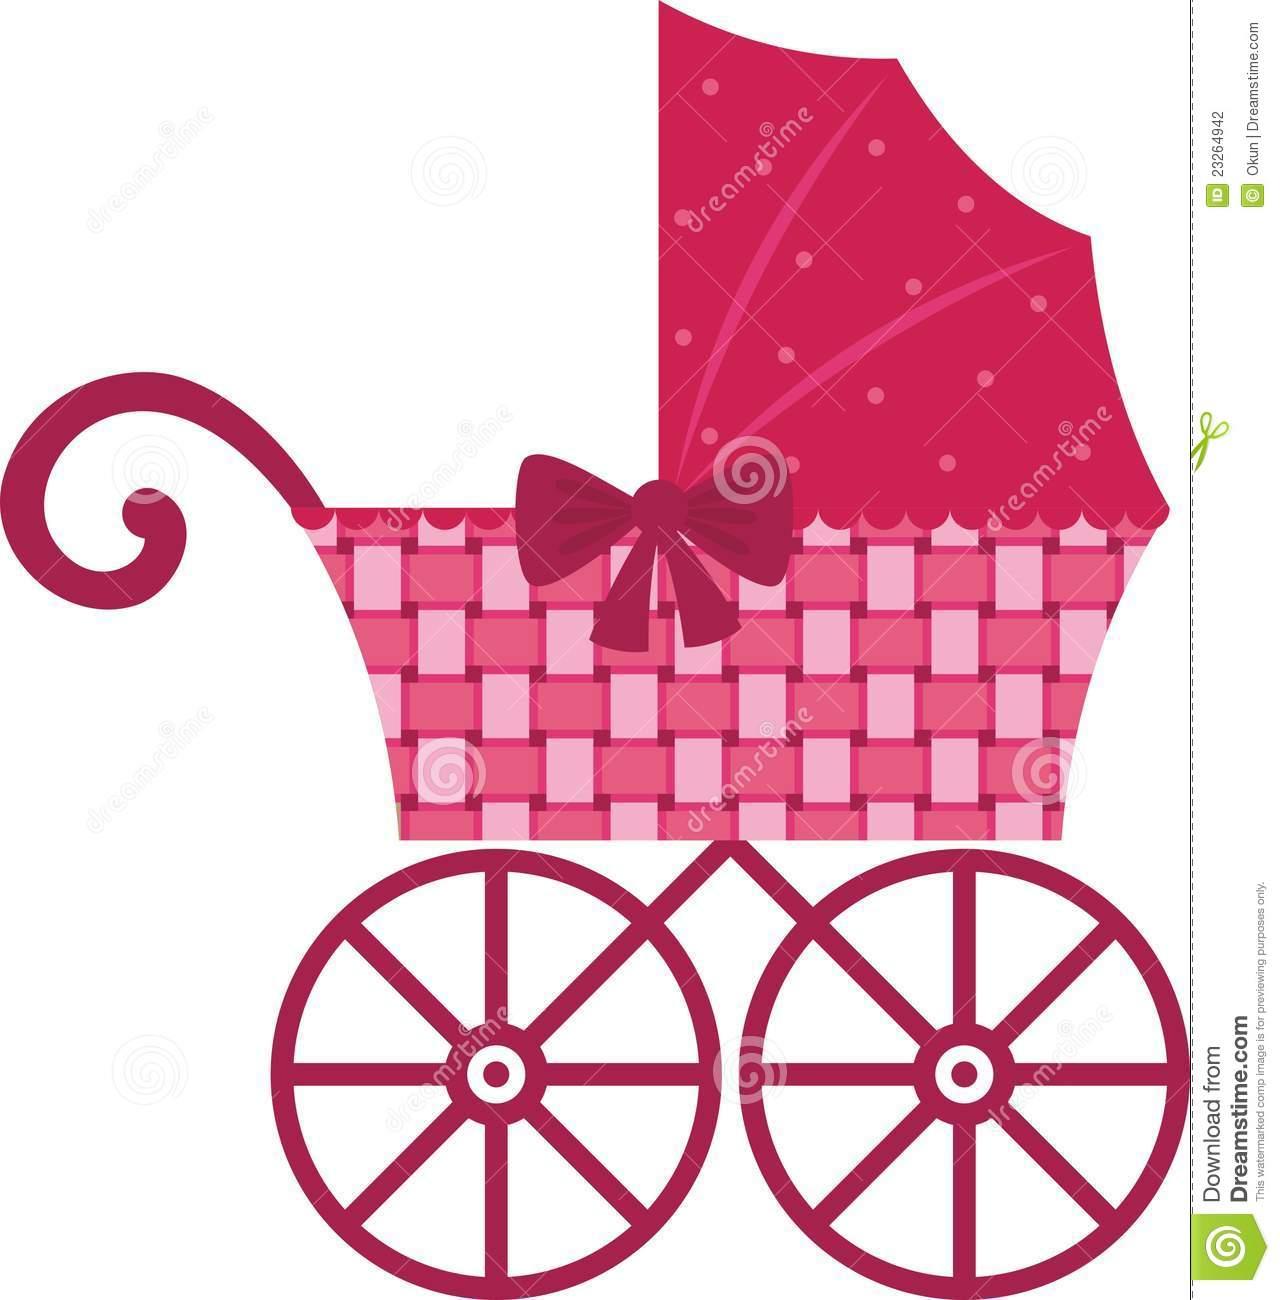 Stroller Clipart Carriage Clipart Pink Pram 23264942 Jpg